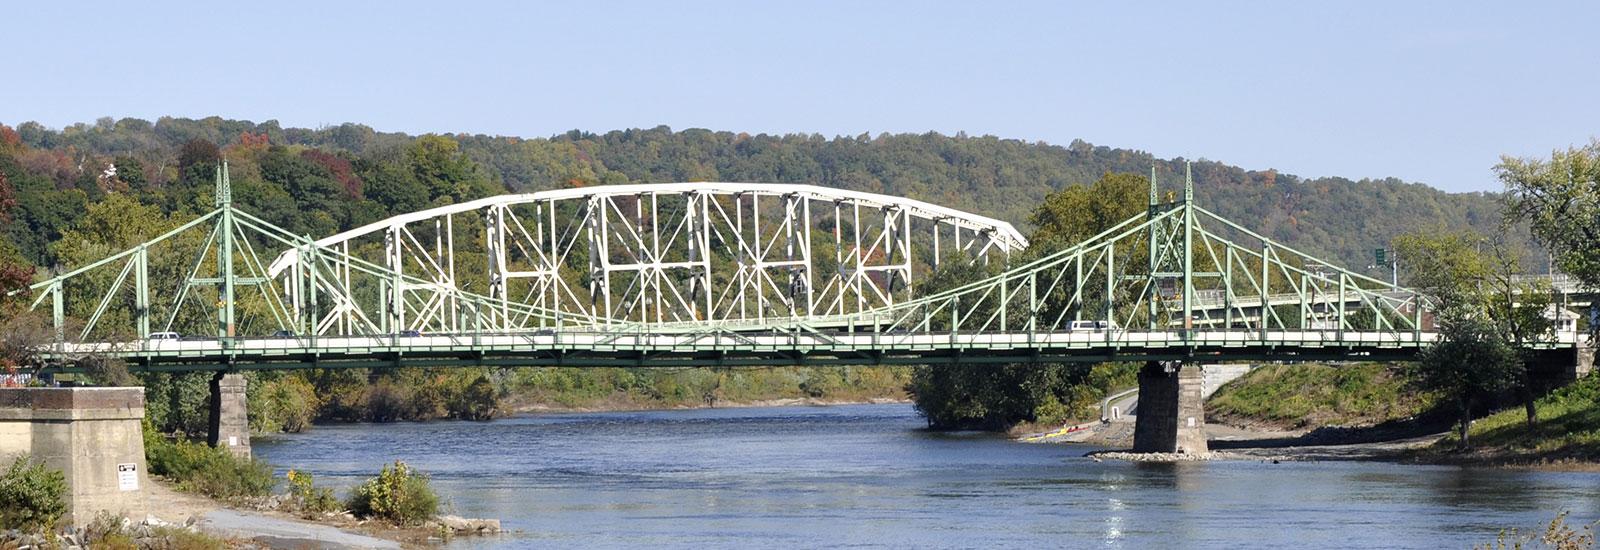 Easton Bridges 2